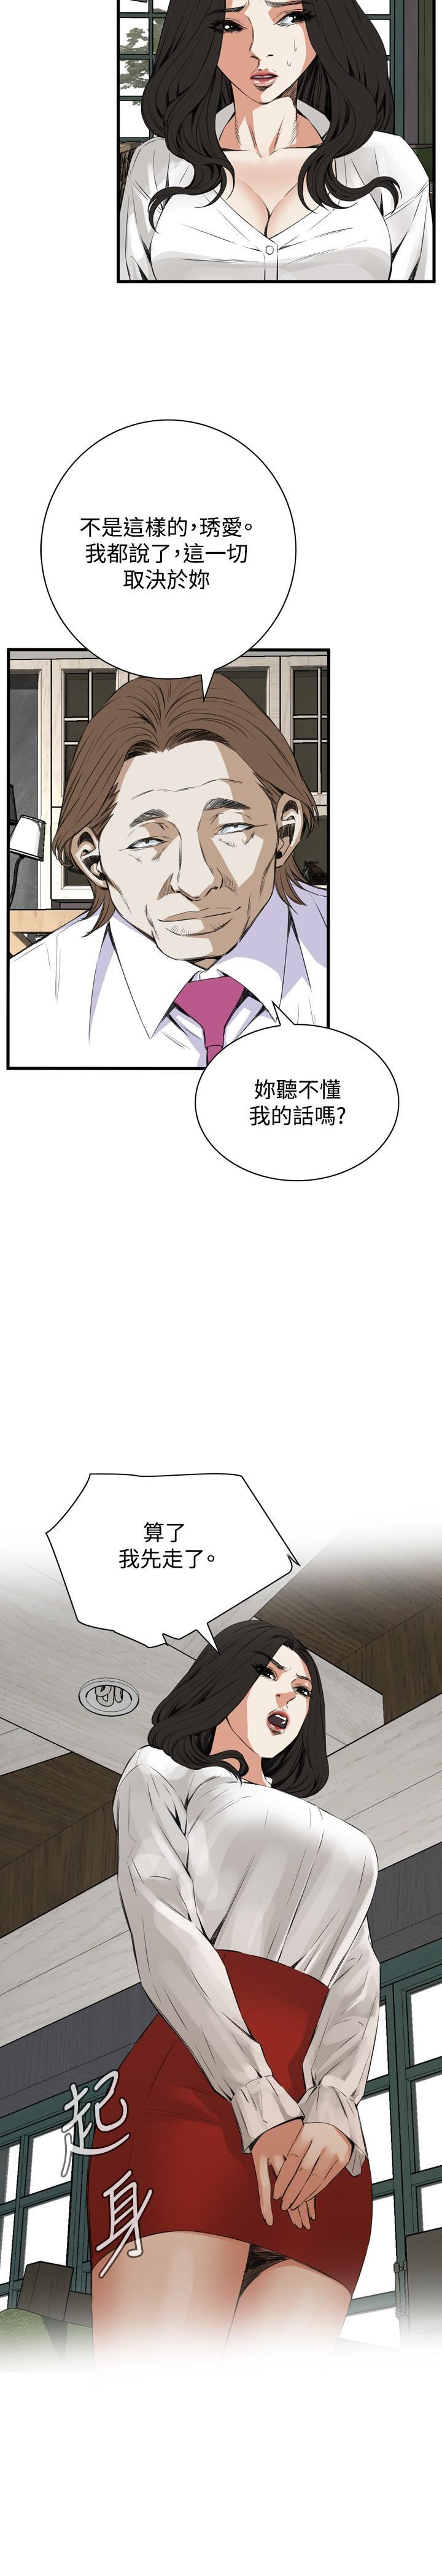 Take a Peek 偷窥 Ch.39~60 [Chinese]中文 277